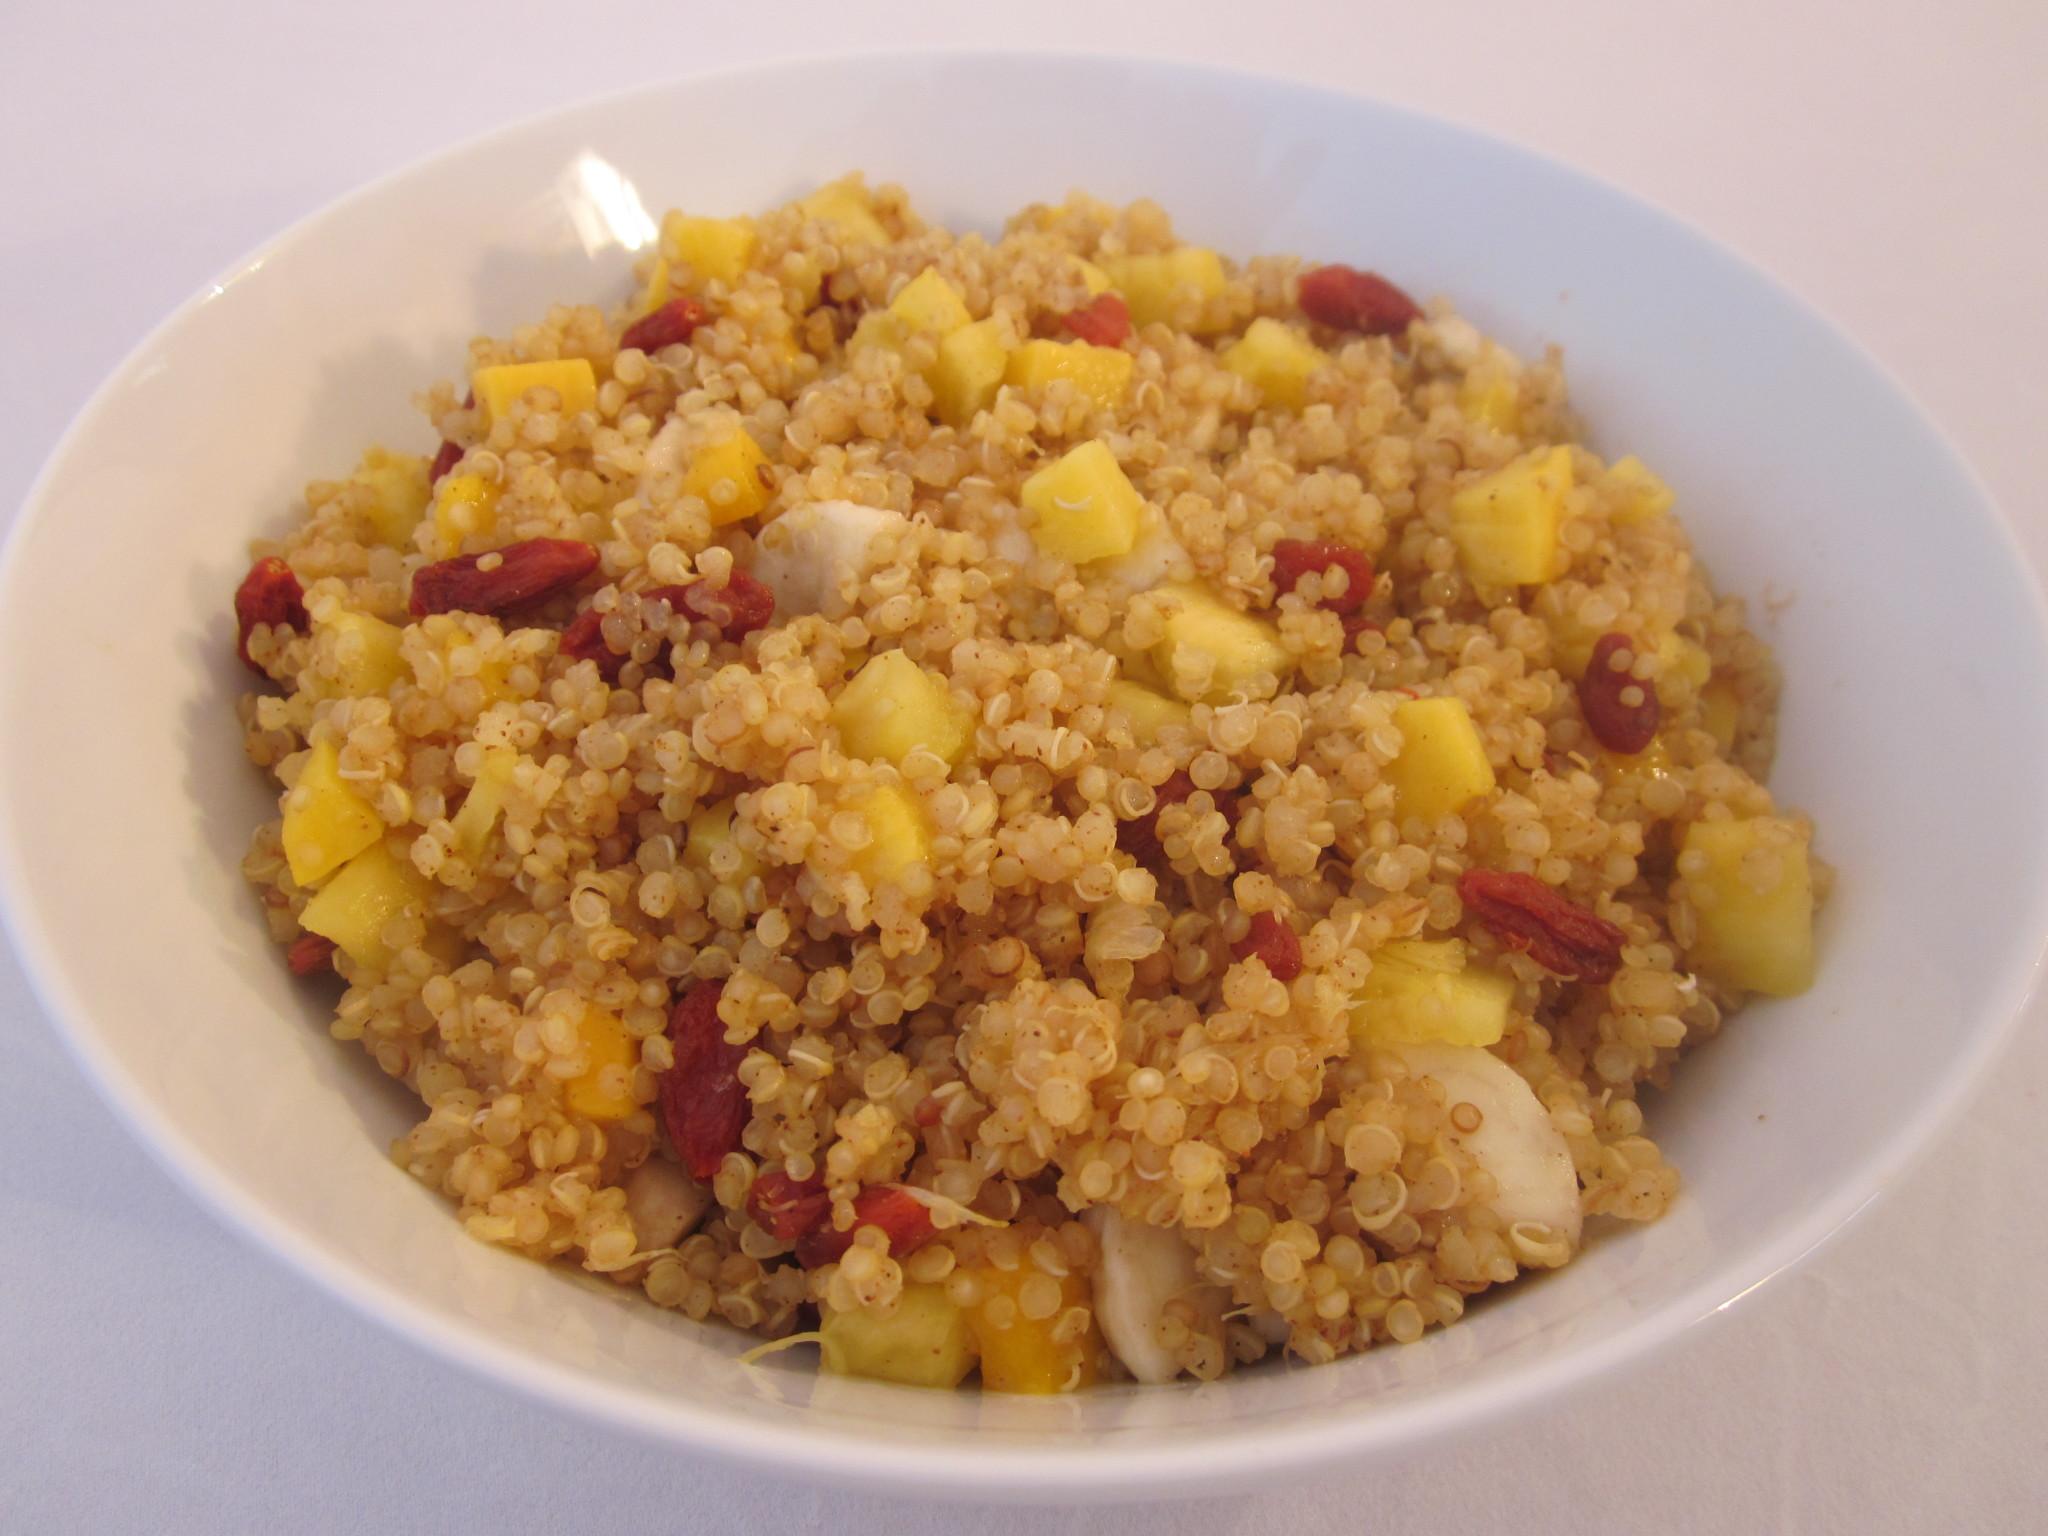 Tropical Sunshine Quinoa Cereal RecipeRobins Key